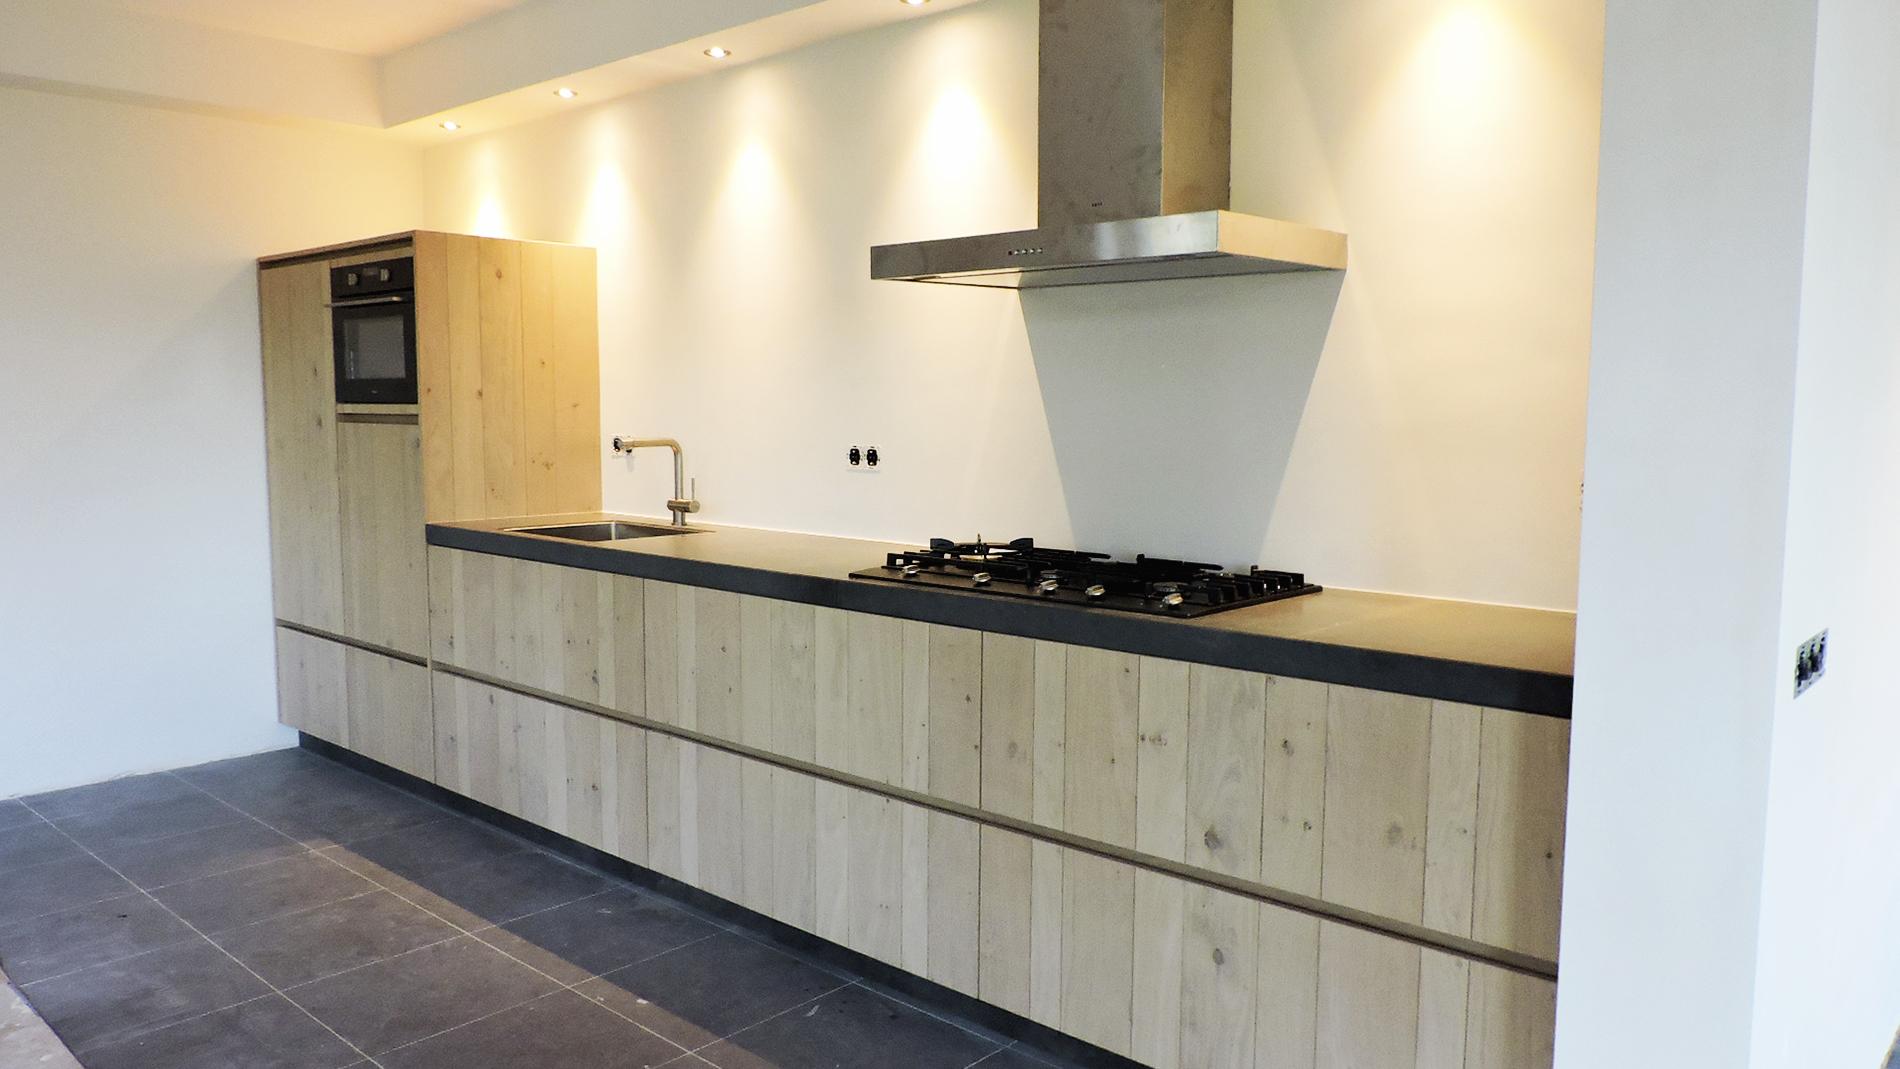 Keuken Eethoek Klein – Atumre.com